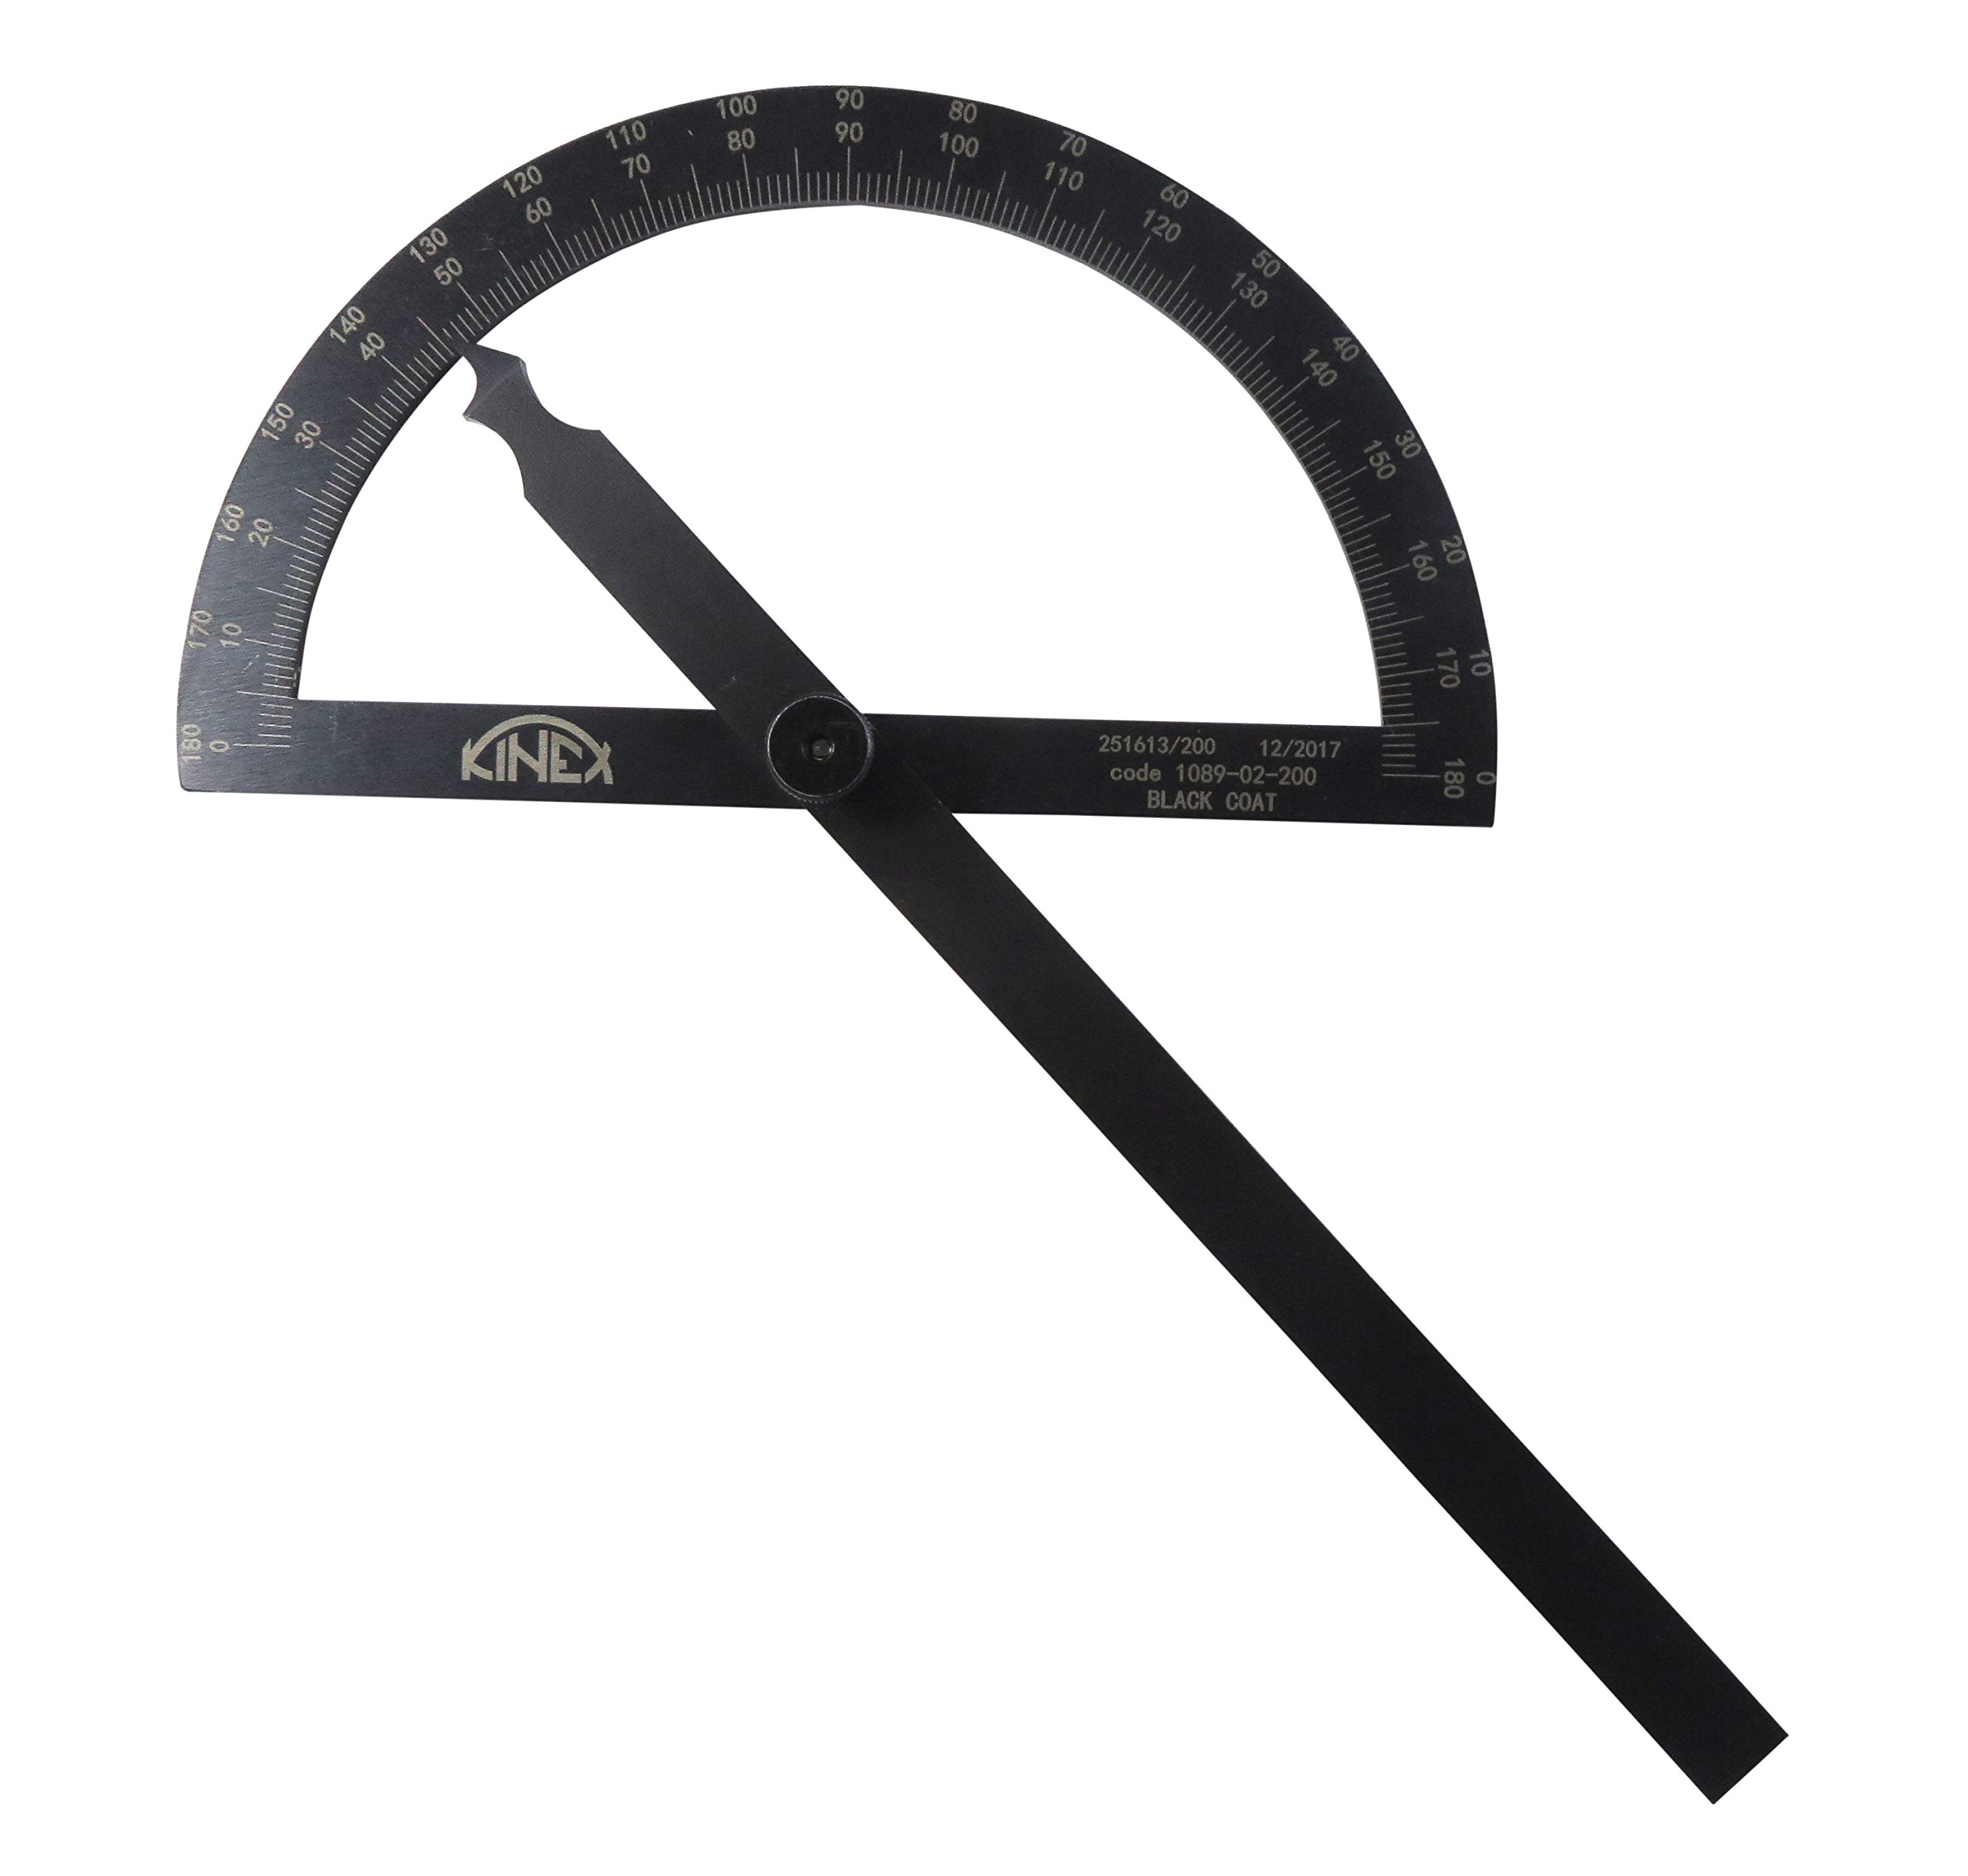 Kinex 1089-02-200 7-1/4'' (200 mm) Gun Metal Finish Black Machinist Protractor Angle Finder